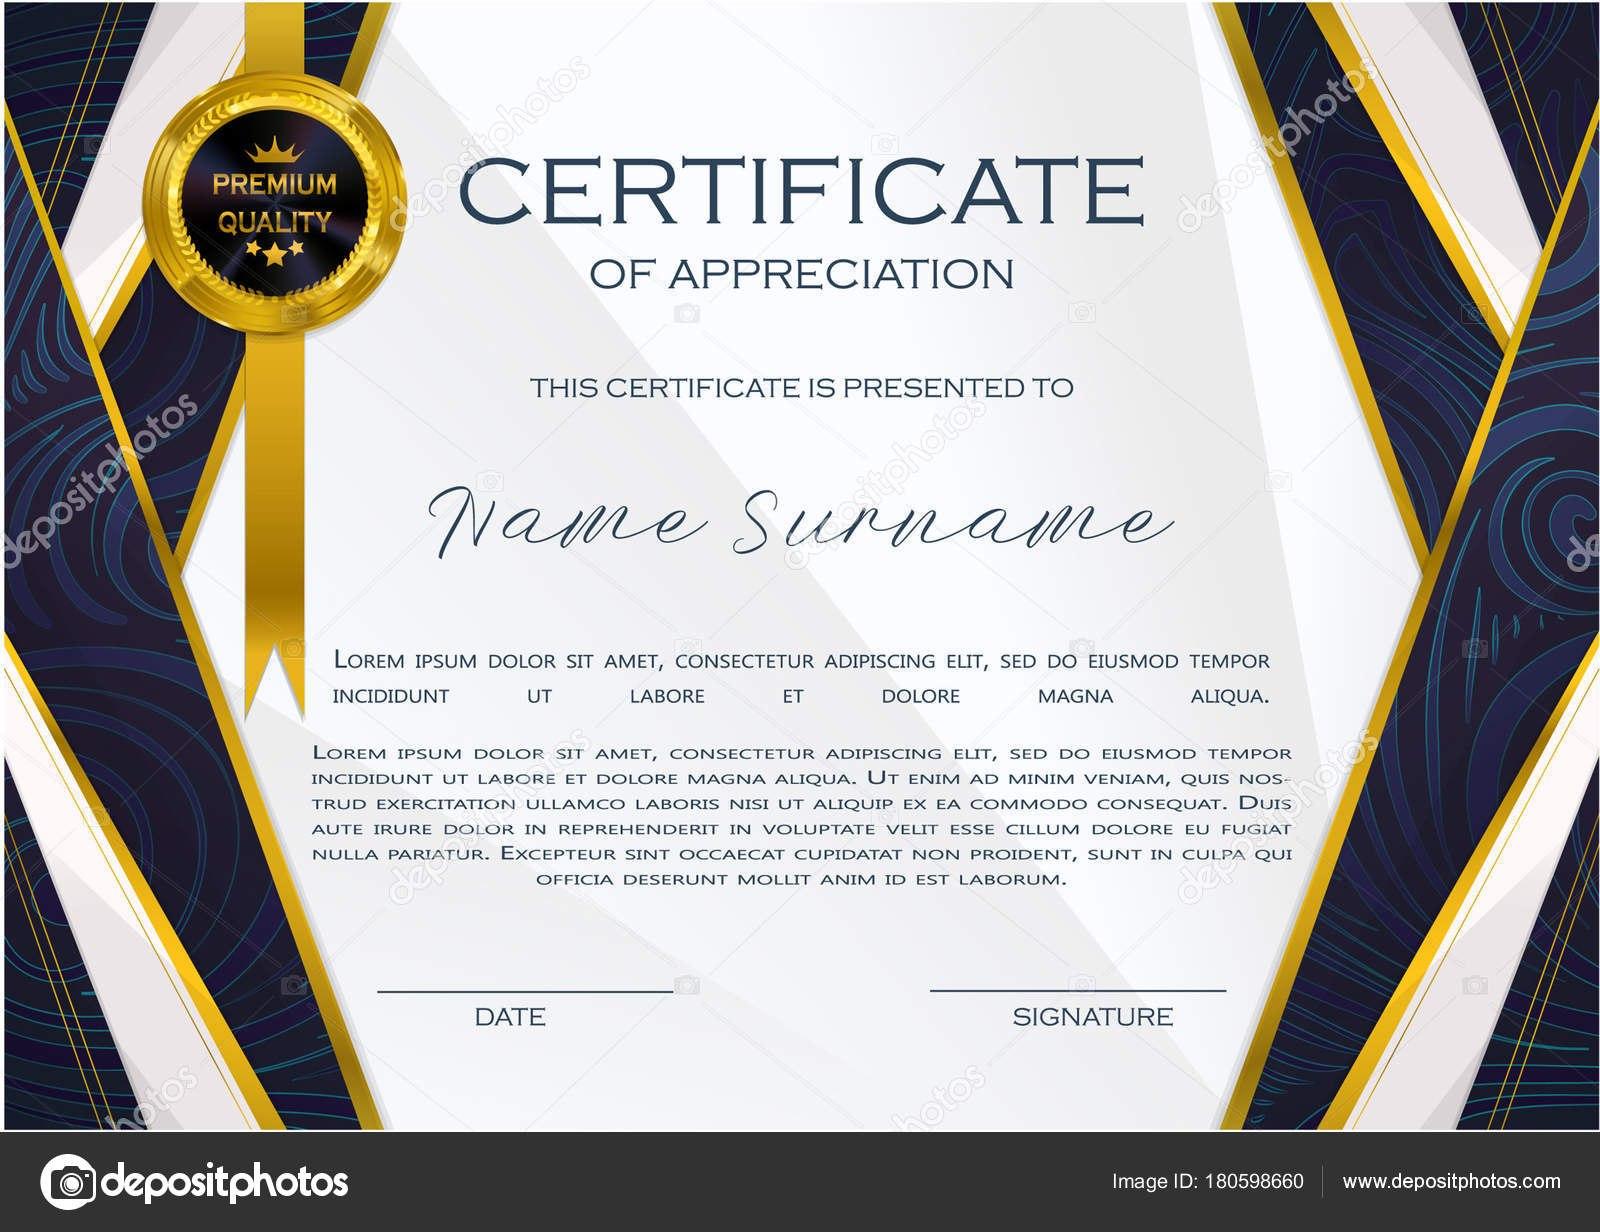 Qualification Certificate Appreciation Design Elegant Luxury Modern In High Resolution Certificate Template